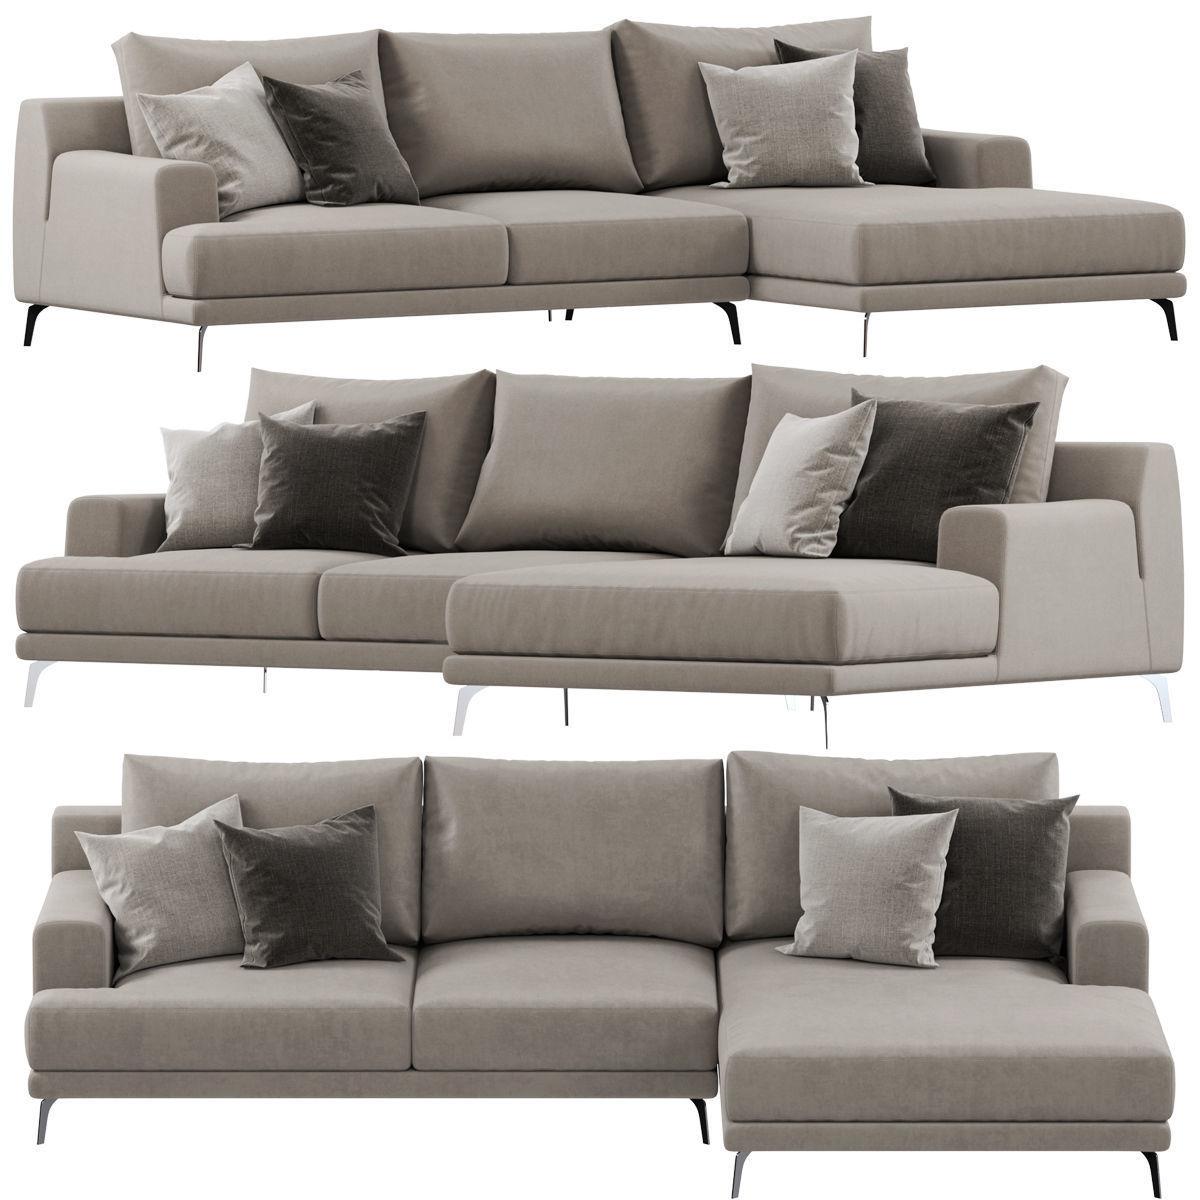 Ditre Italia Foster sofa